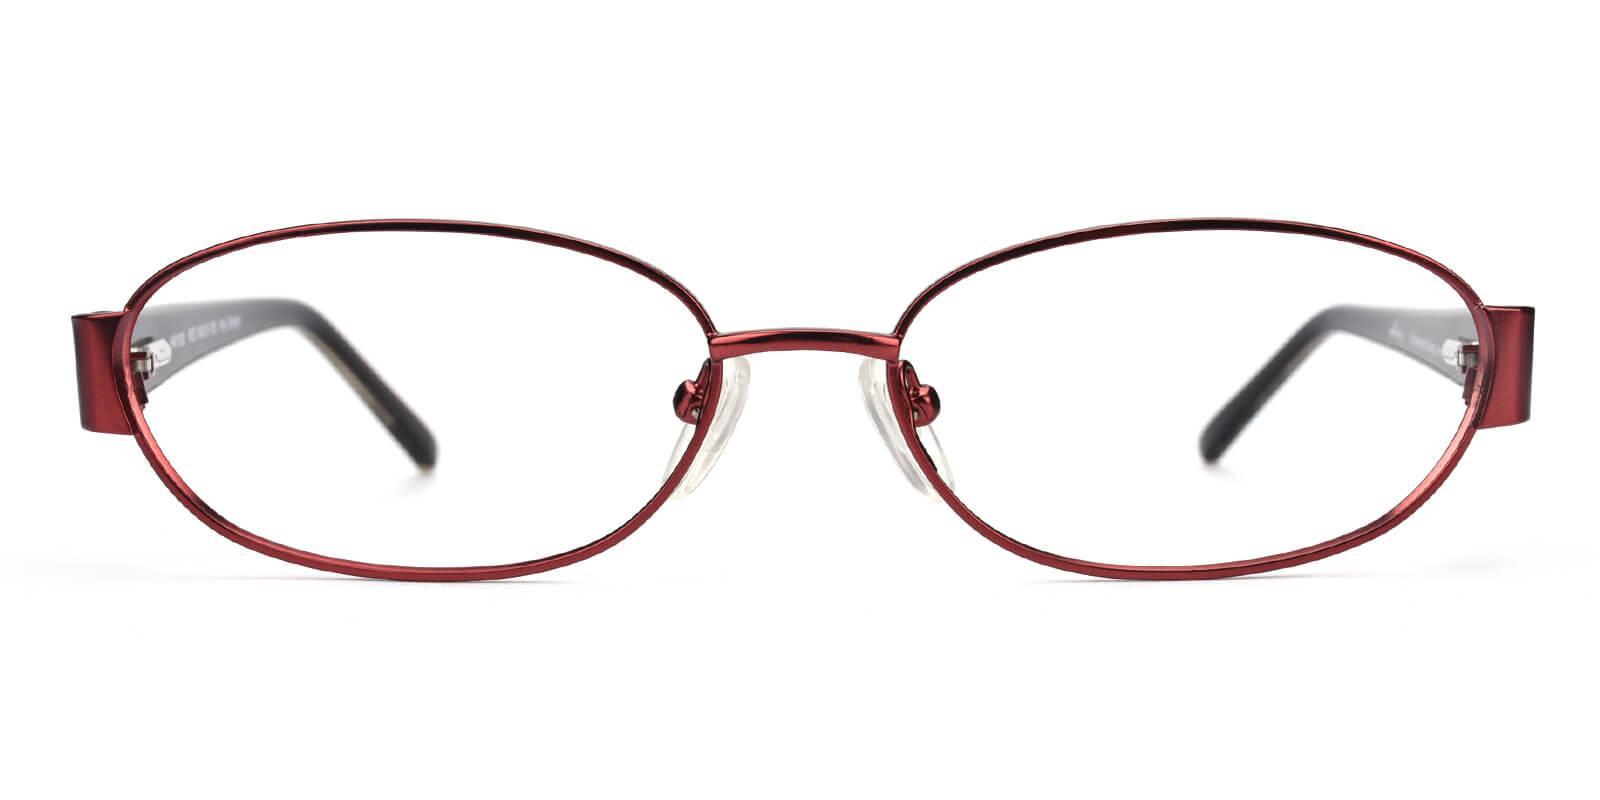 Katelian-Red-Oval-Combination-Eyeglasses-additional2